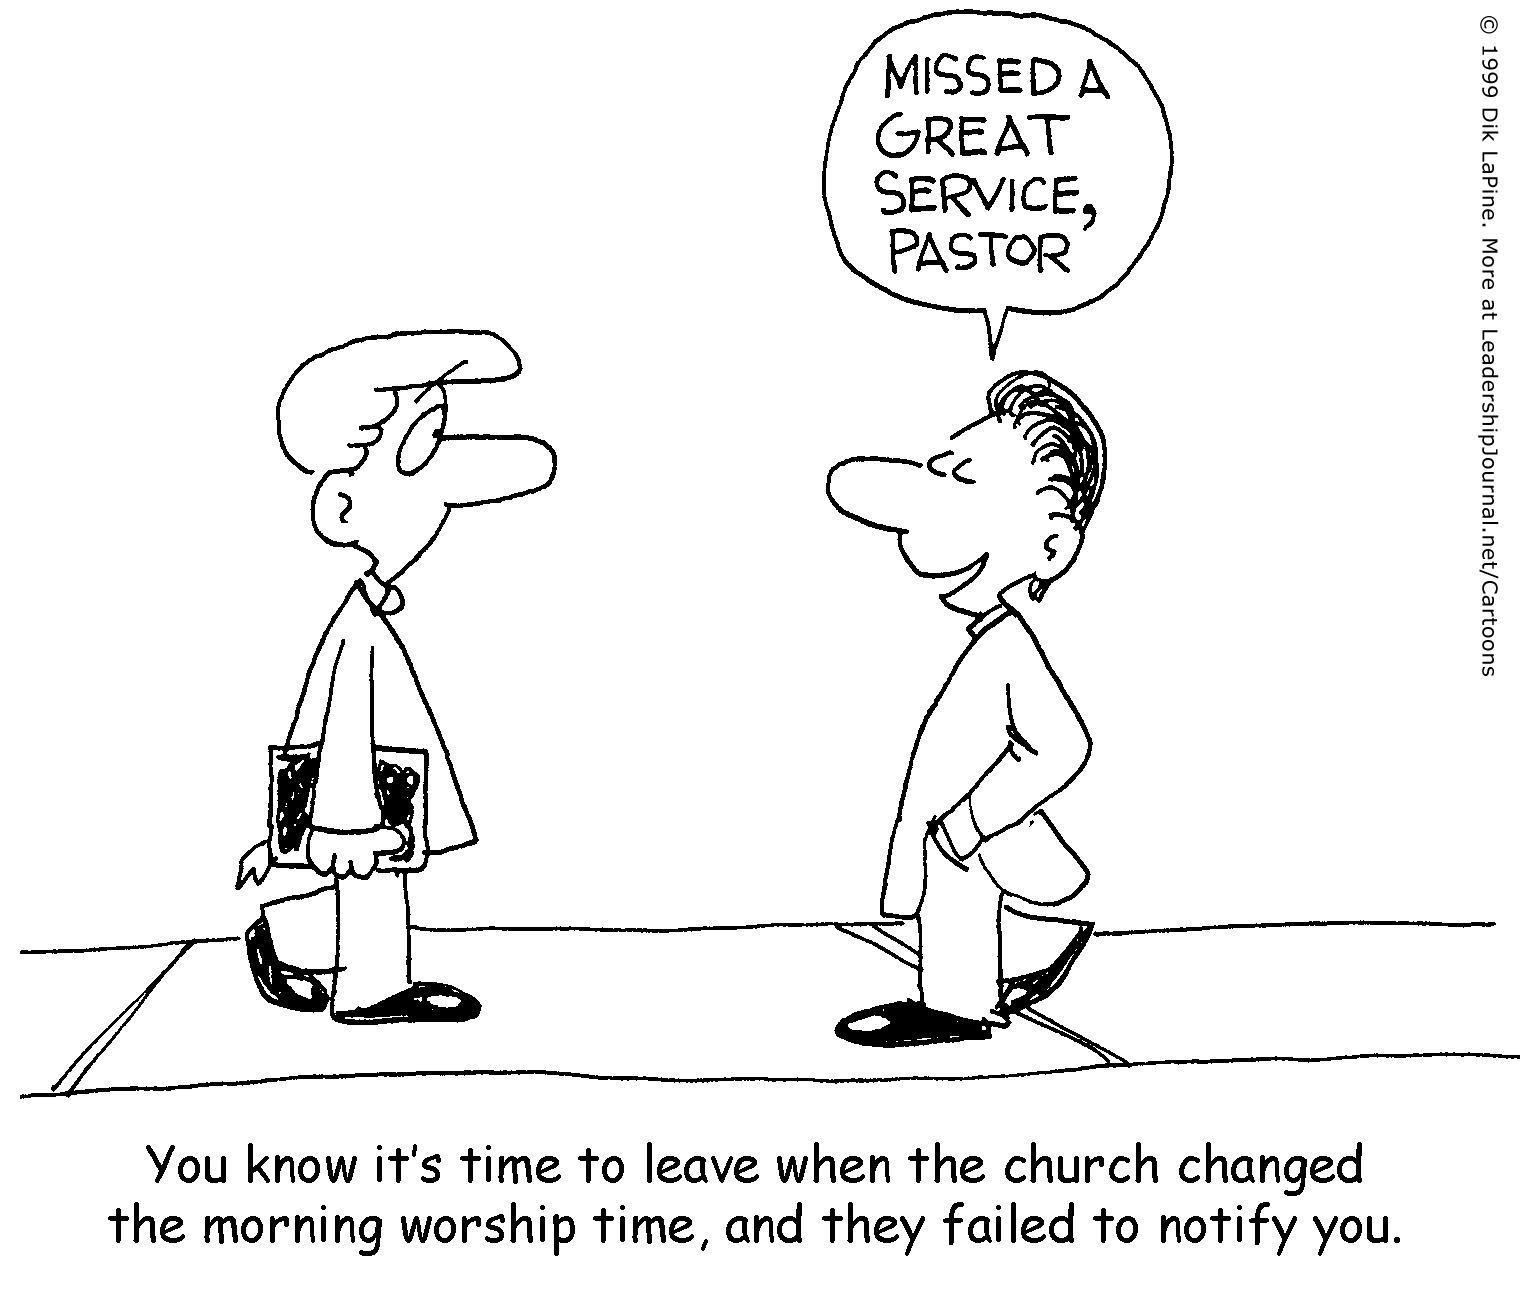 Change of Service Ousts Pastor | CT Pastors